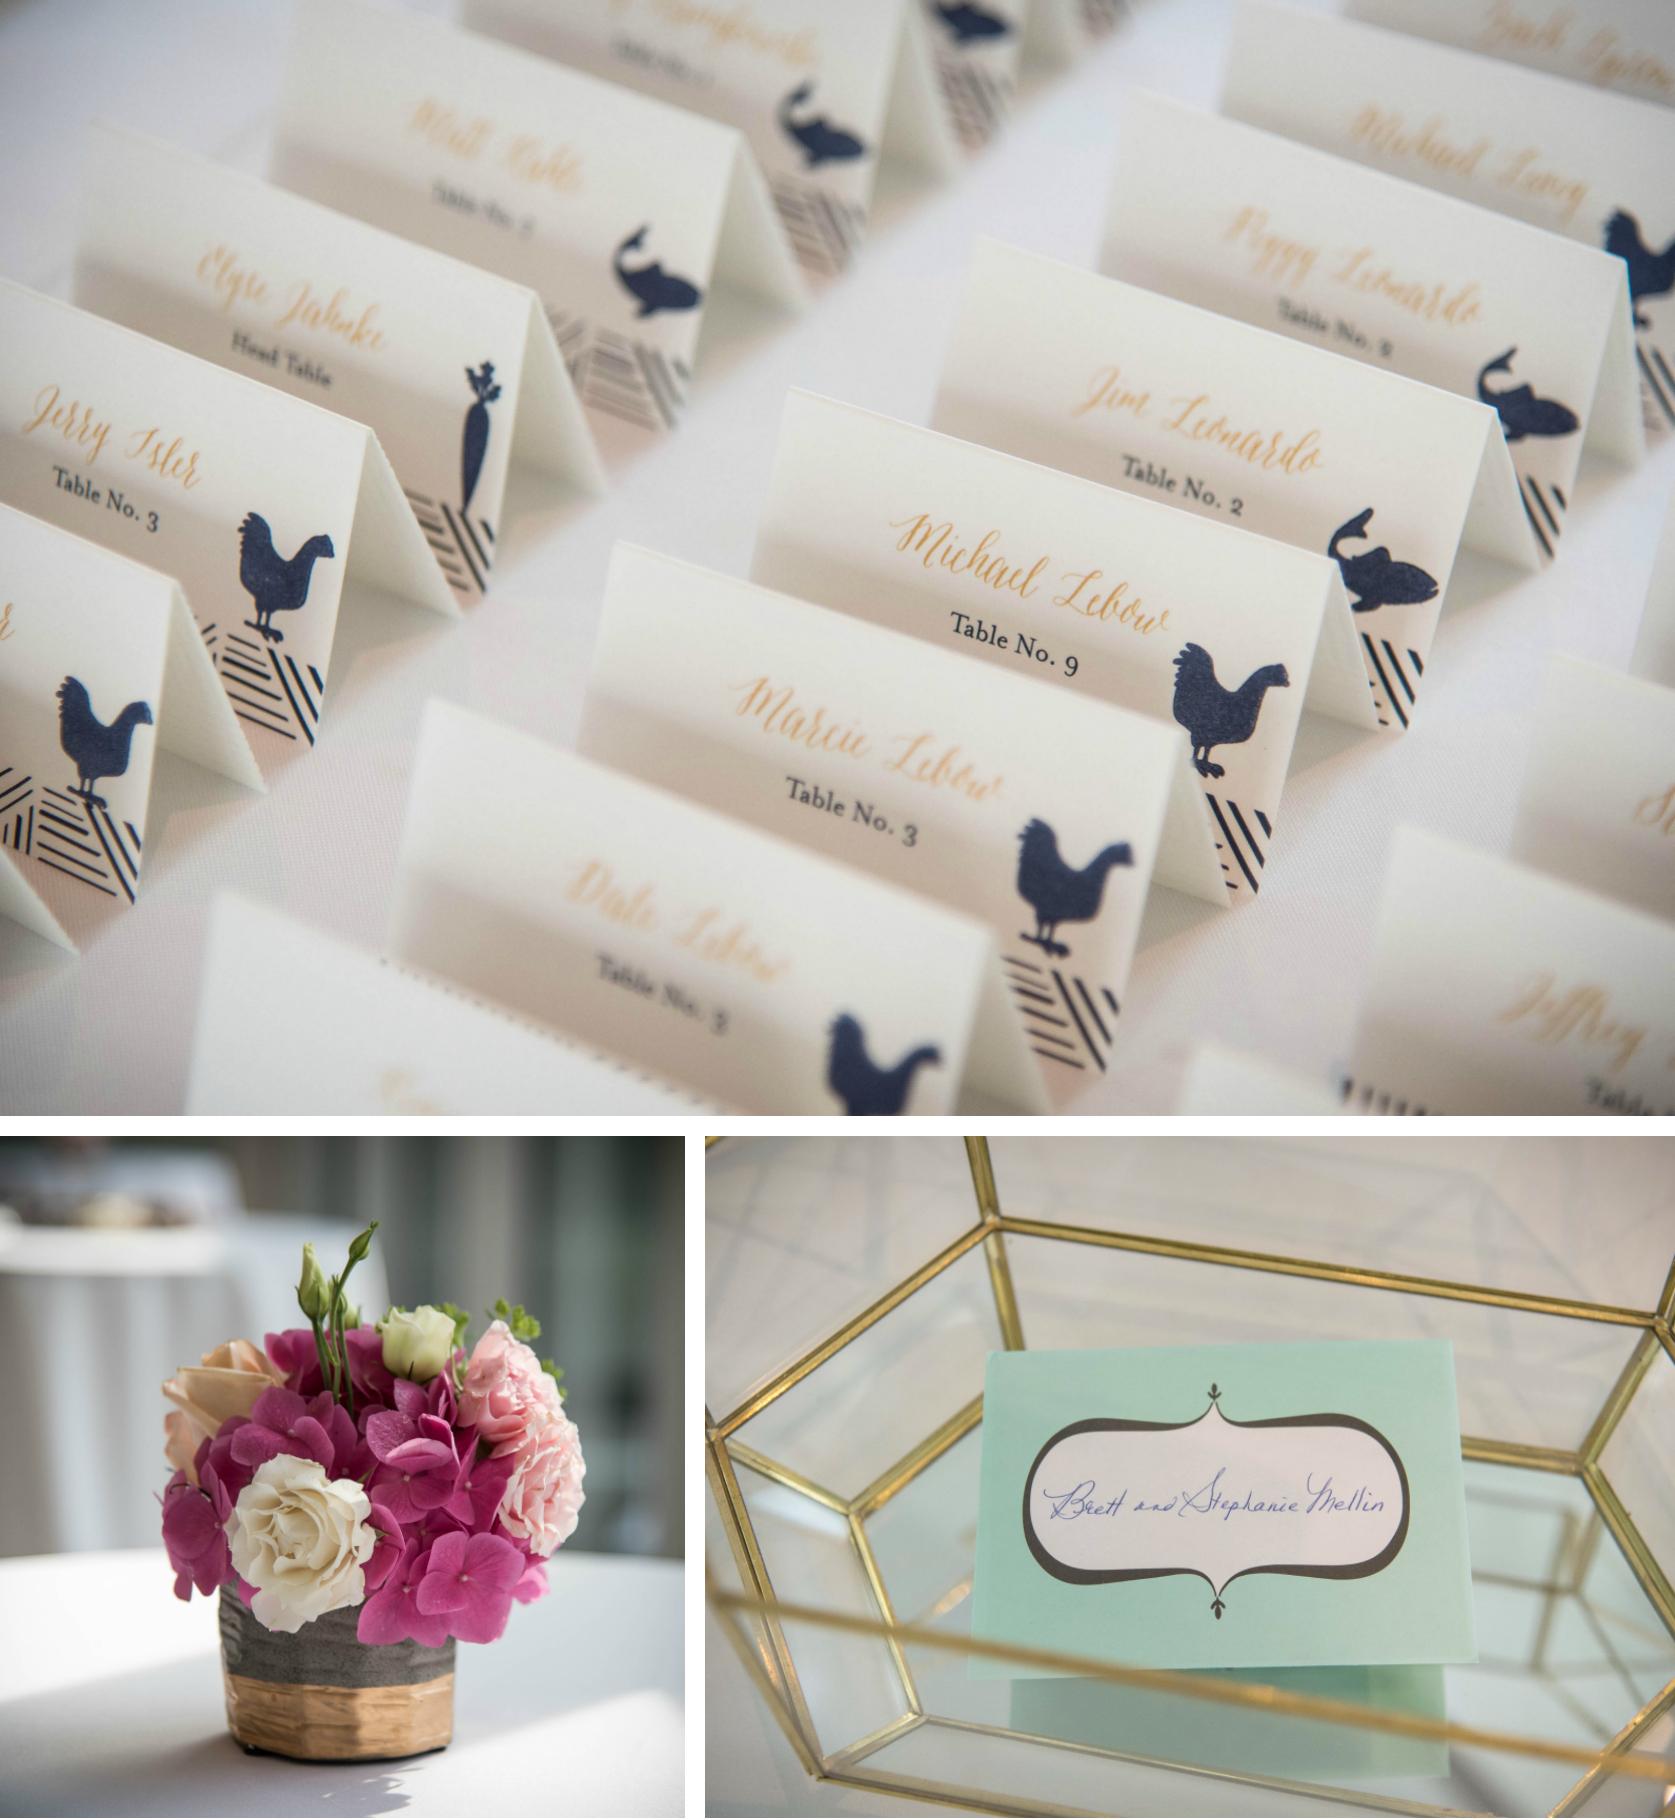 JS Weddings and Events, Grand Rapids Wedding Planner and Floral Designer - Grand Rapids Art Museum Midcentury Modern Wedding